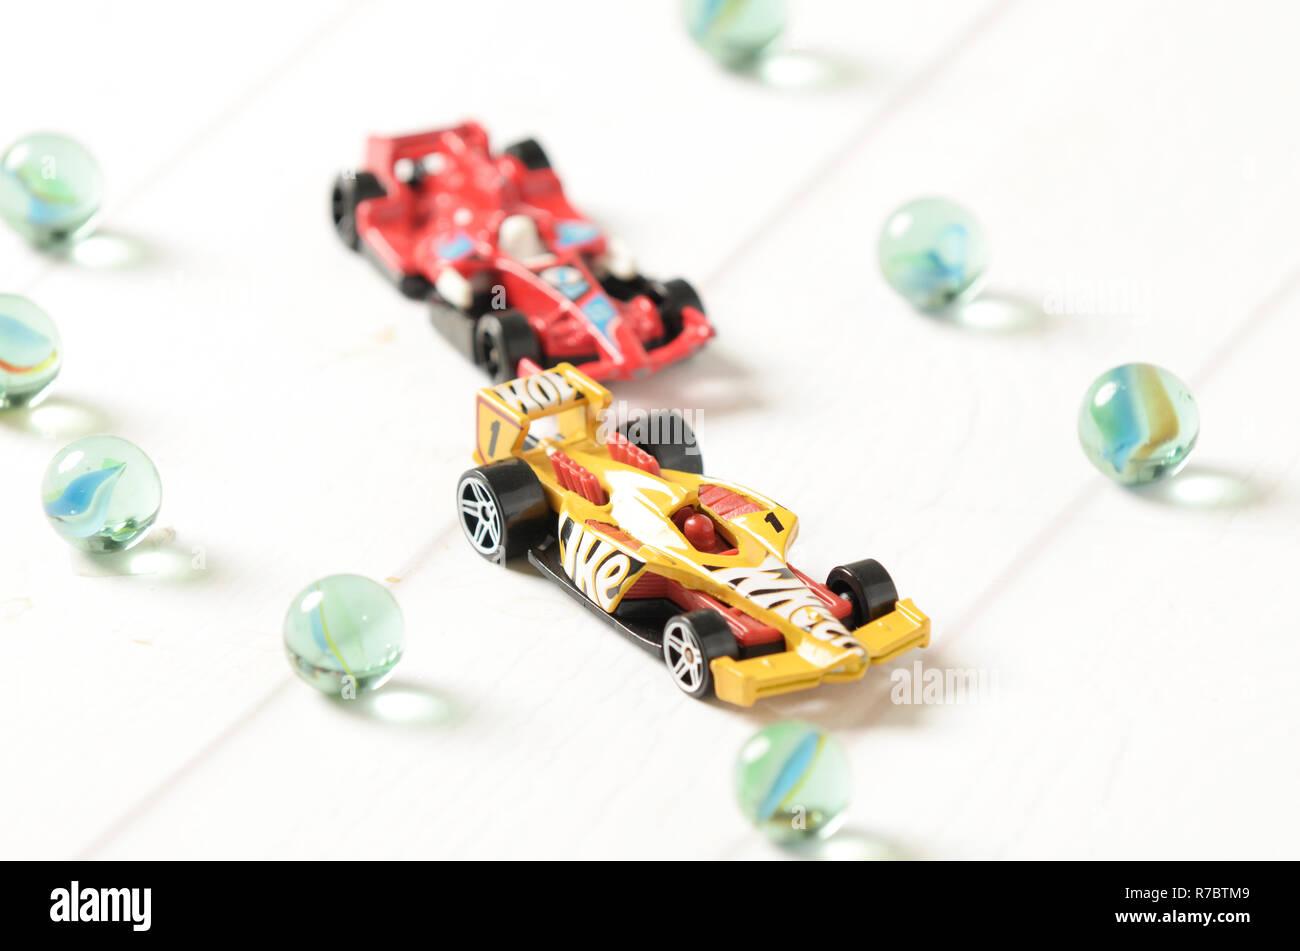 Hot wheels diecast  F1 racing Stock Photo